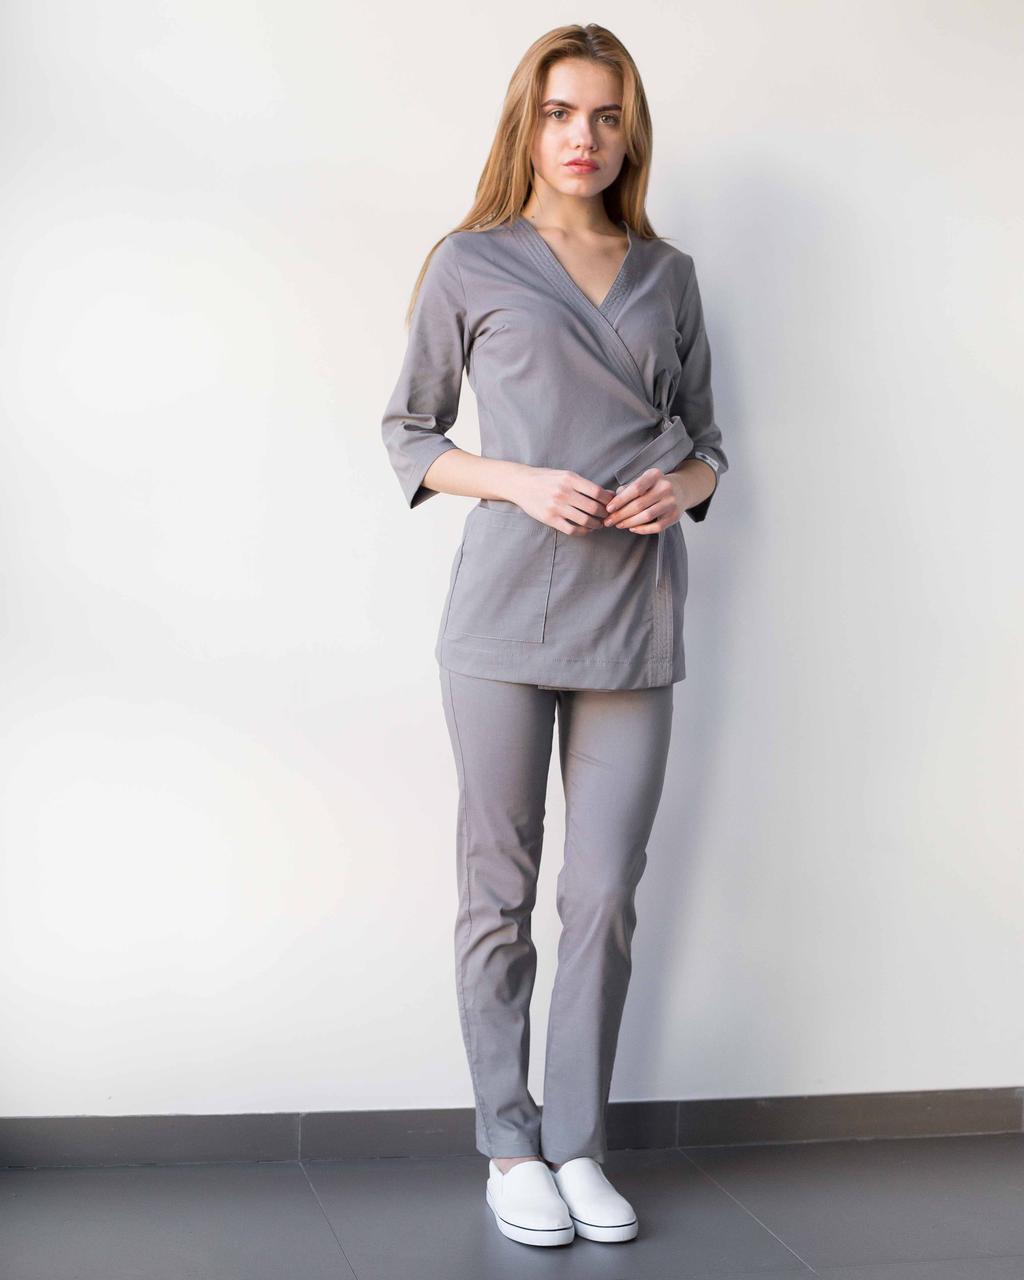 Медицинский женский костюм Шанхай серый